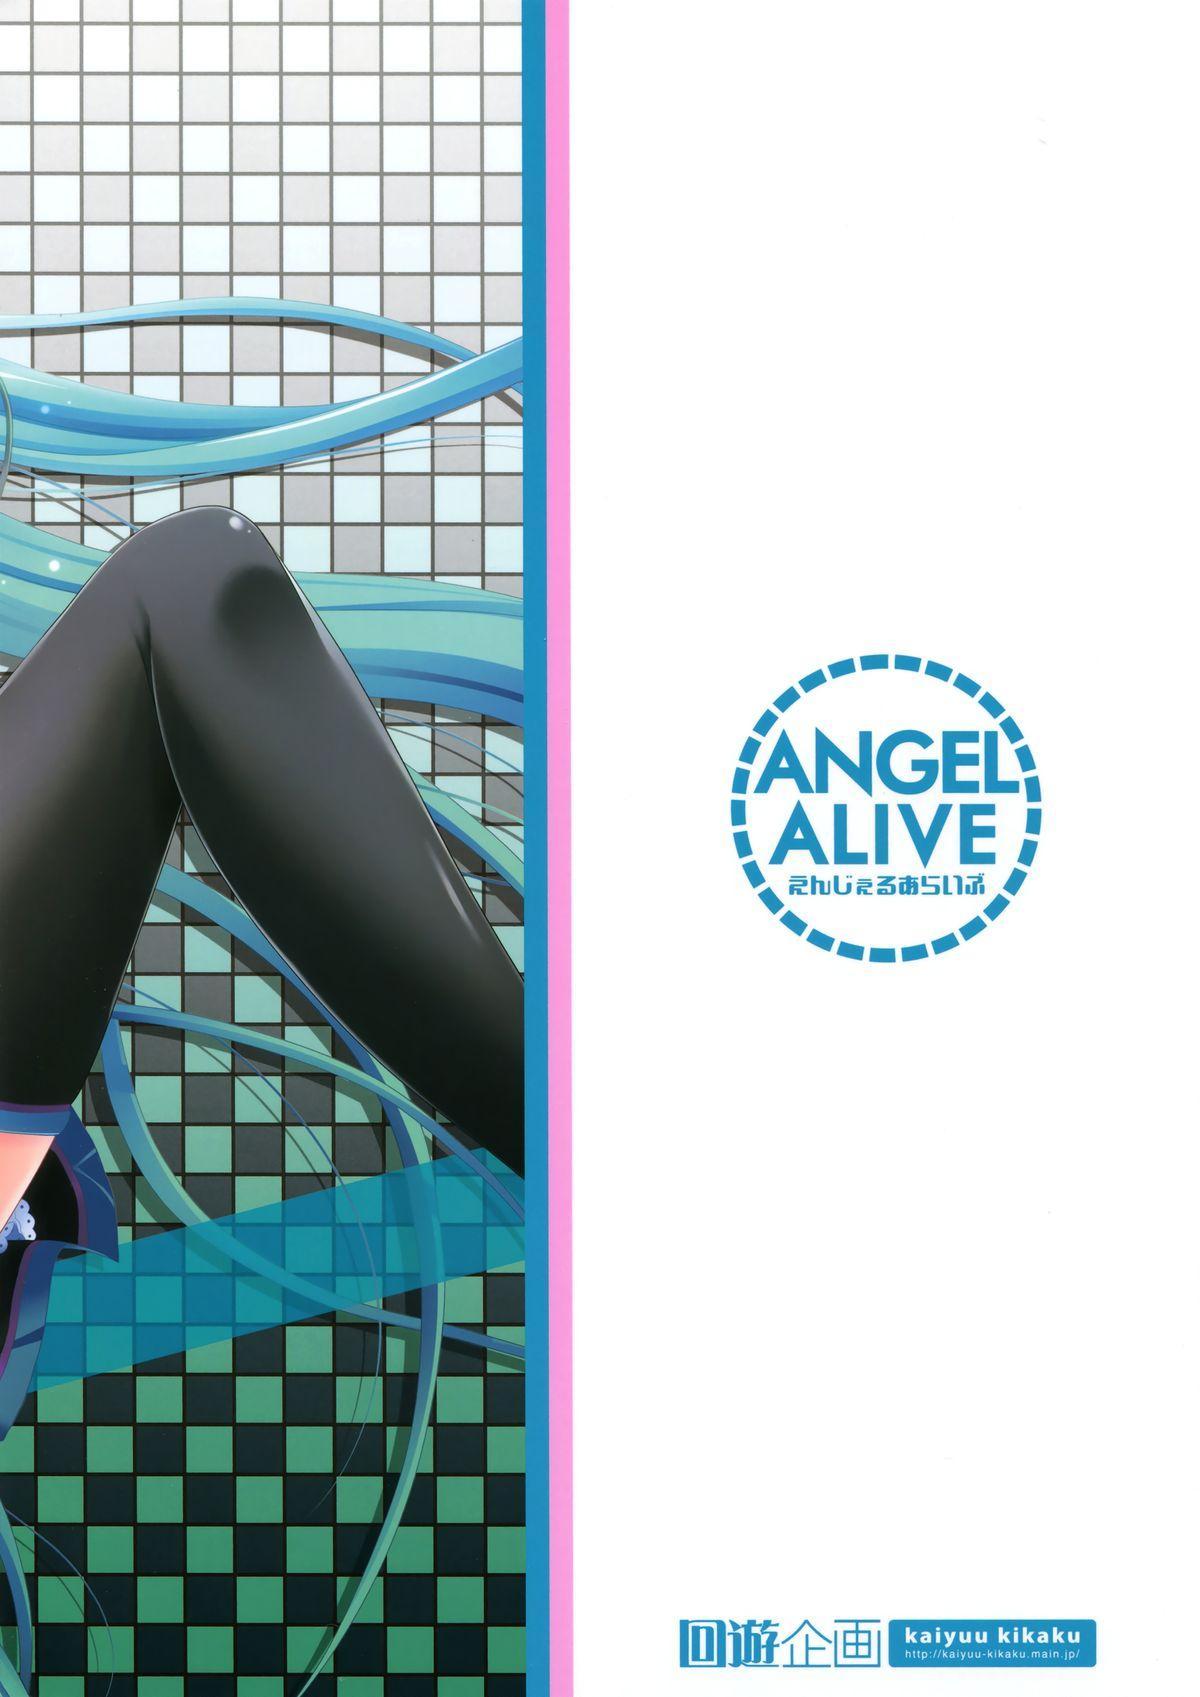 ANGEL ALIVE 24